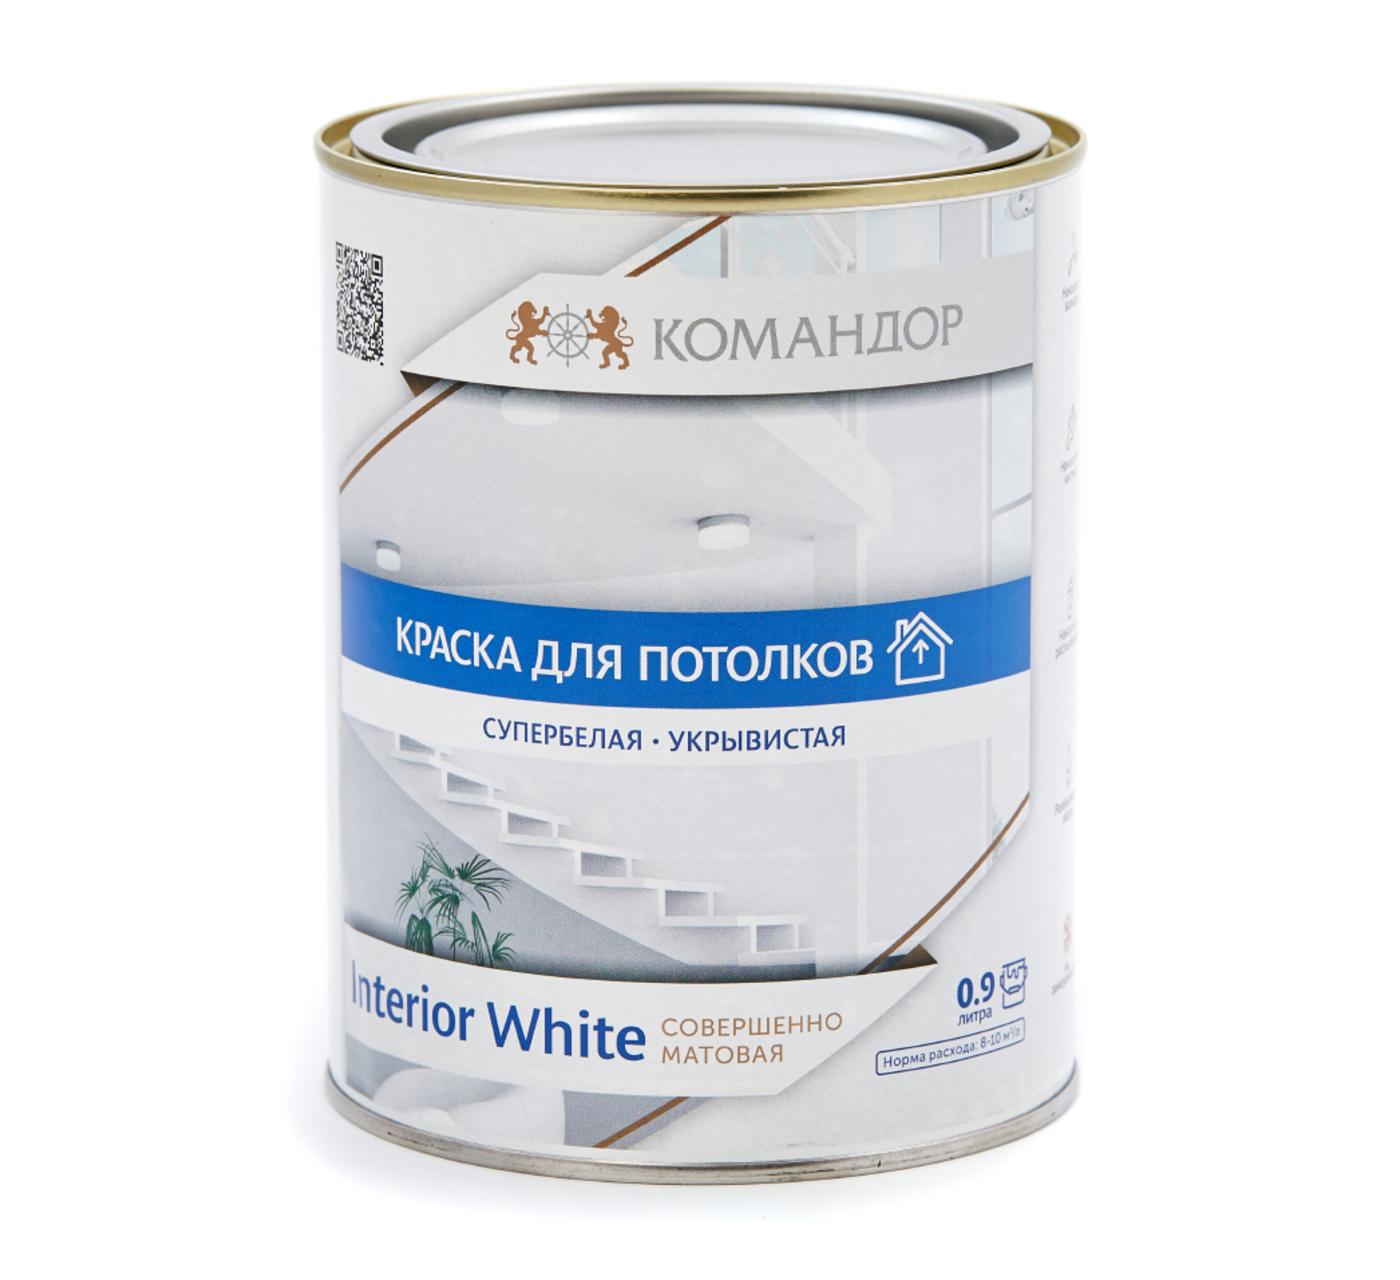 INTERIOR WHITE краска для потолков